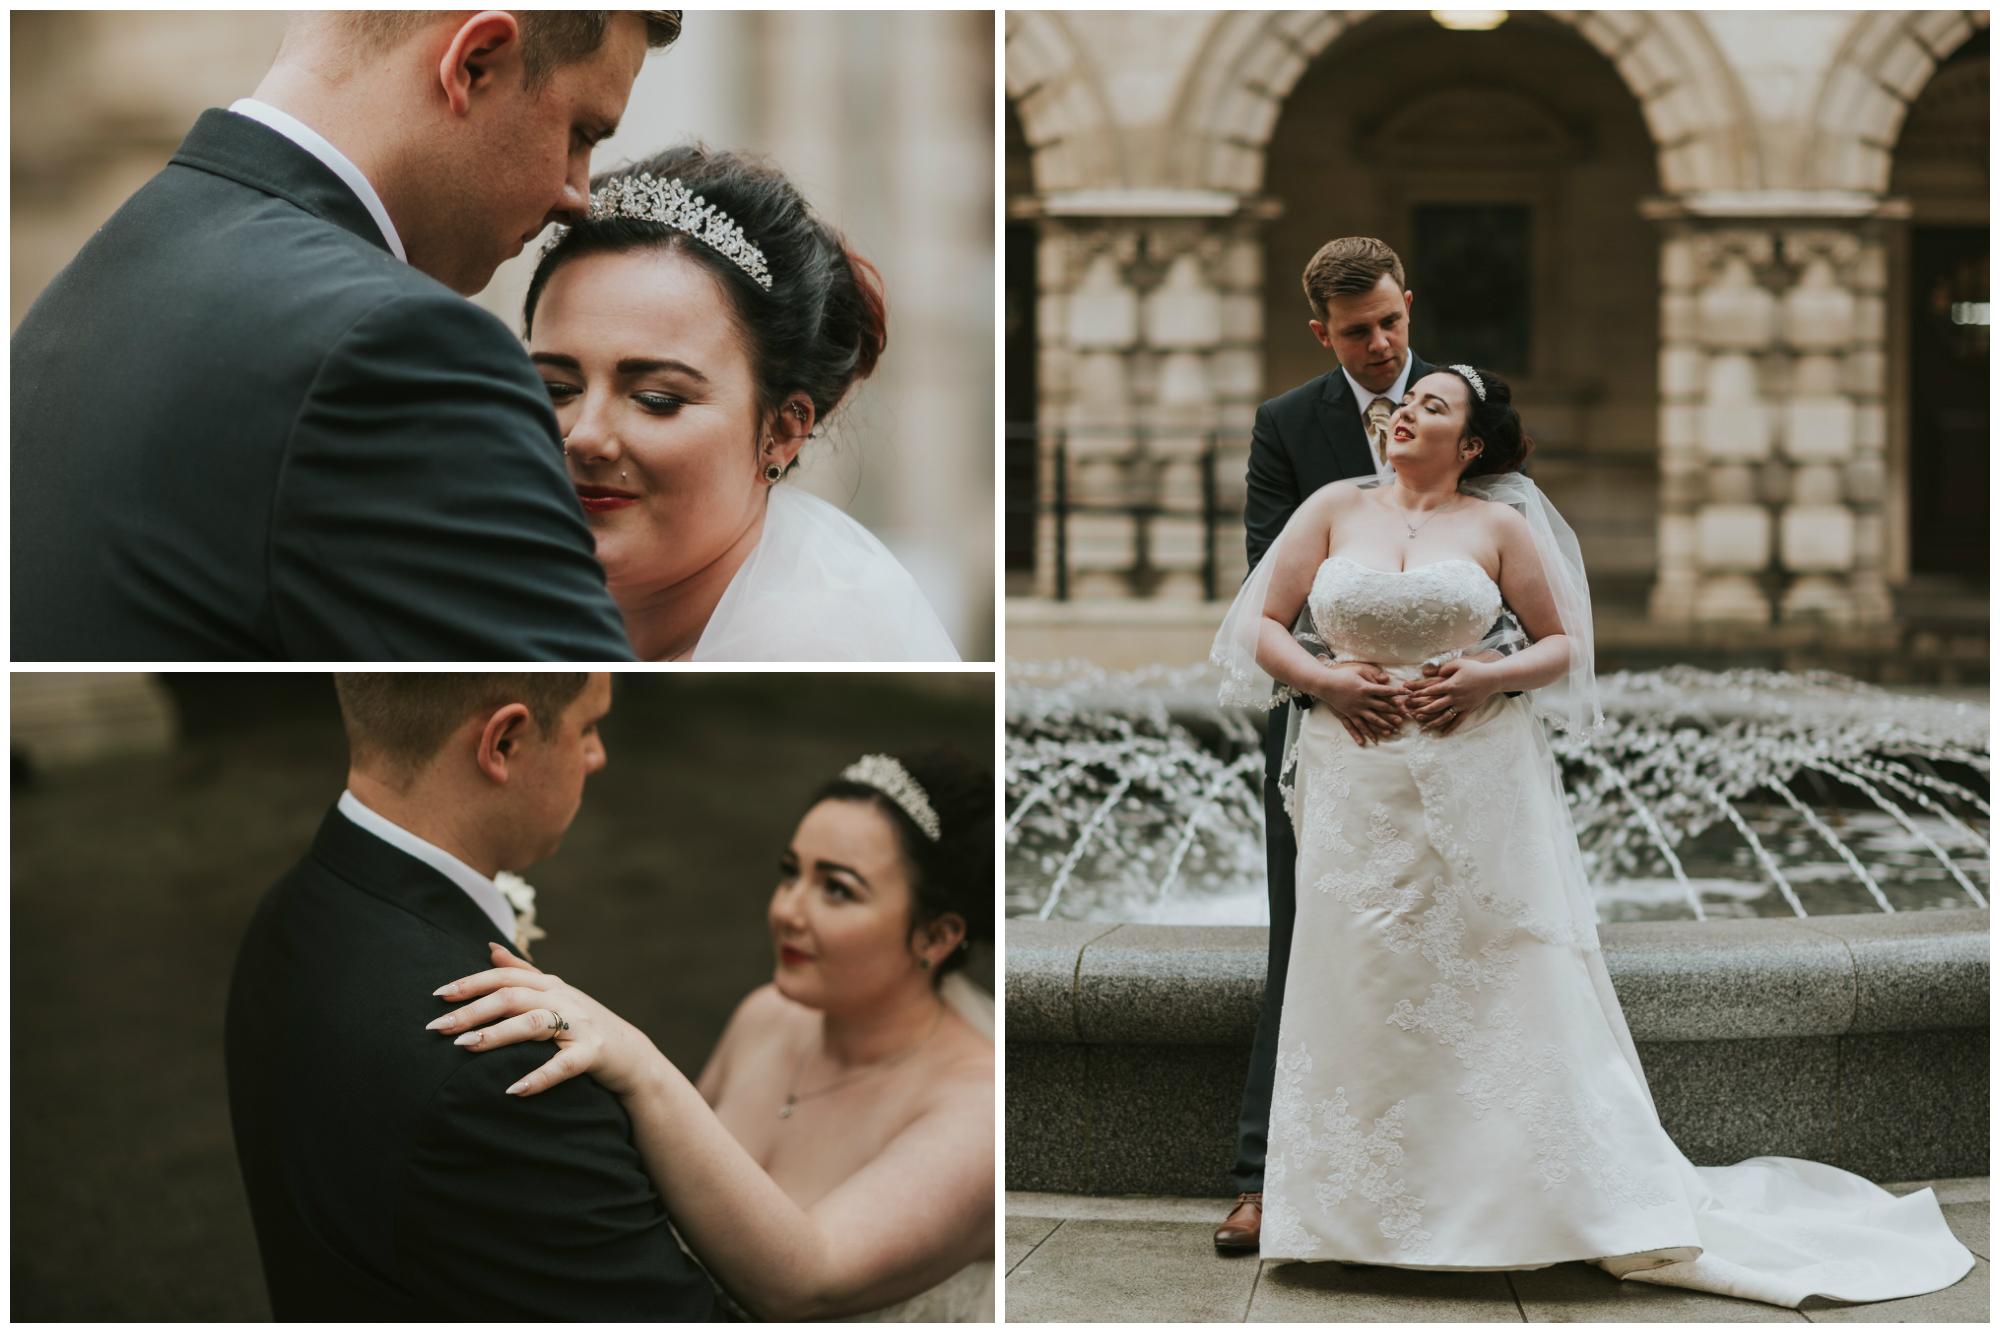 ten square hotel wedding ceremony belfast city hall groom bride portraits